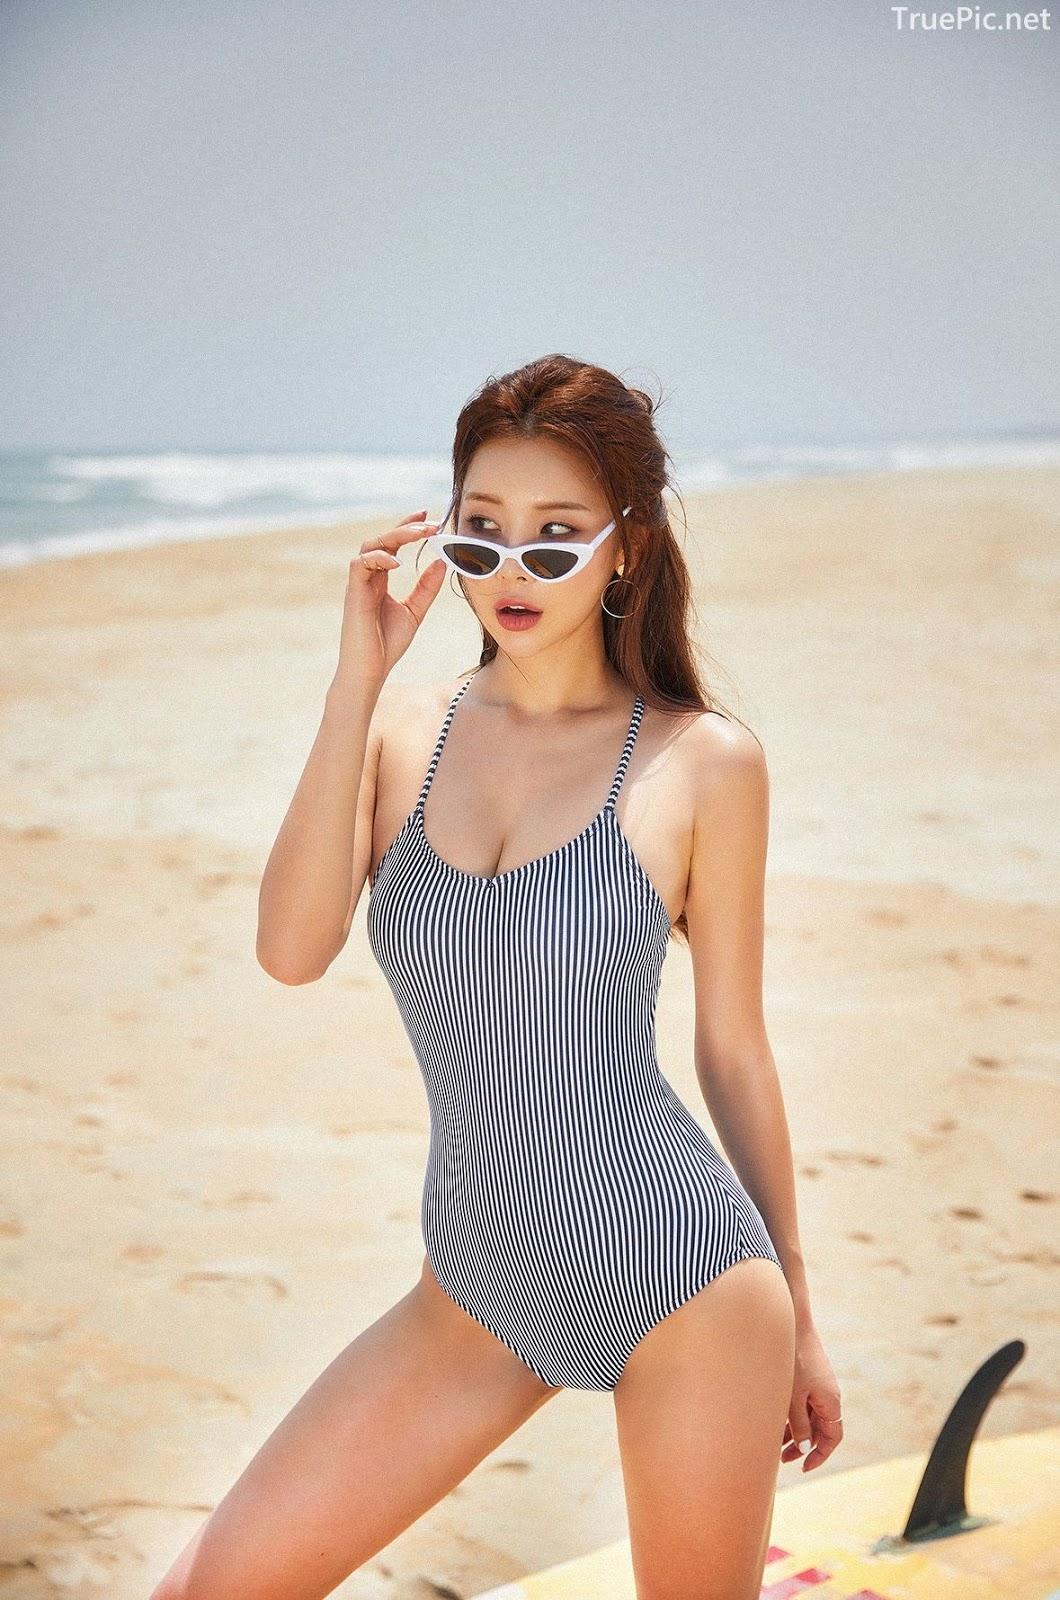 Korean model and fashion - Park Da Hyun - Hightension Swimsuit Set - Picture 3